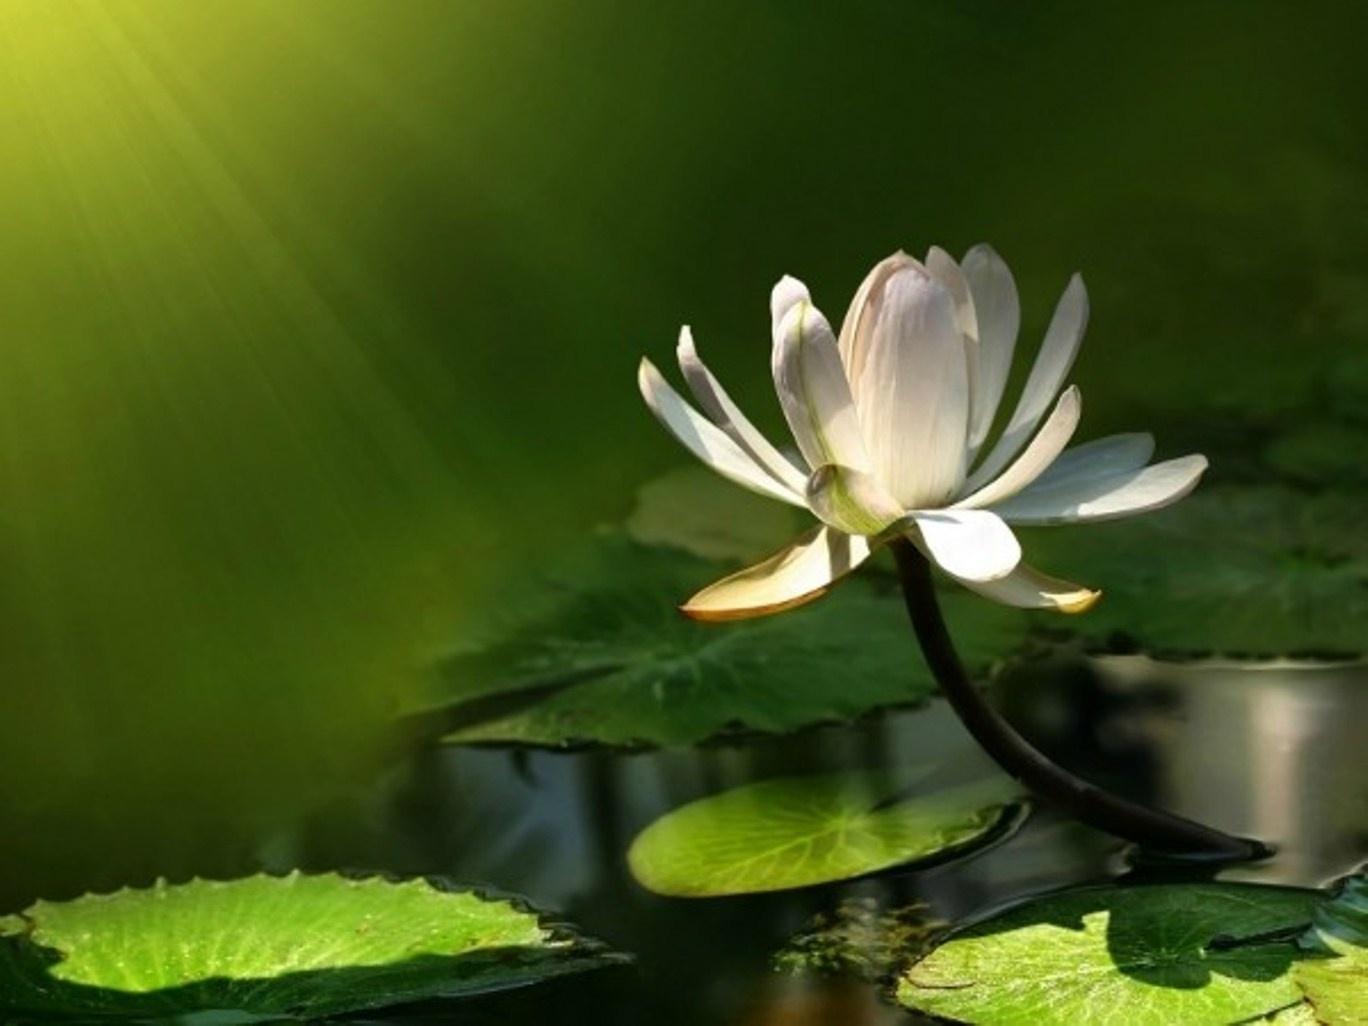 Lotus Wallpapers Hd